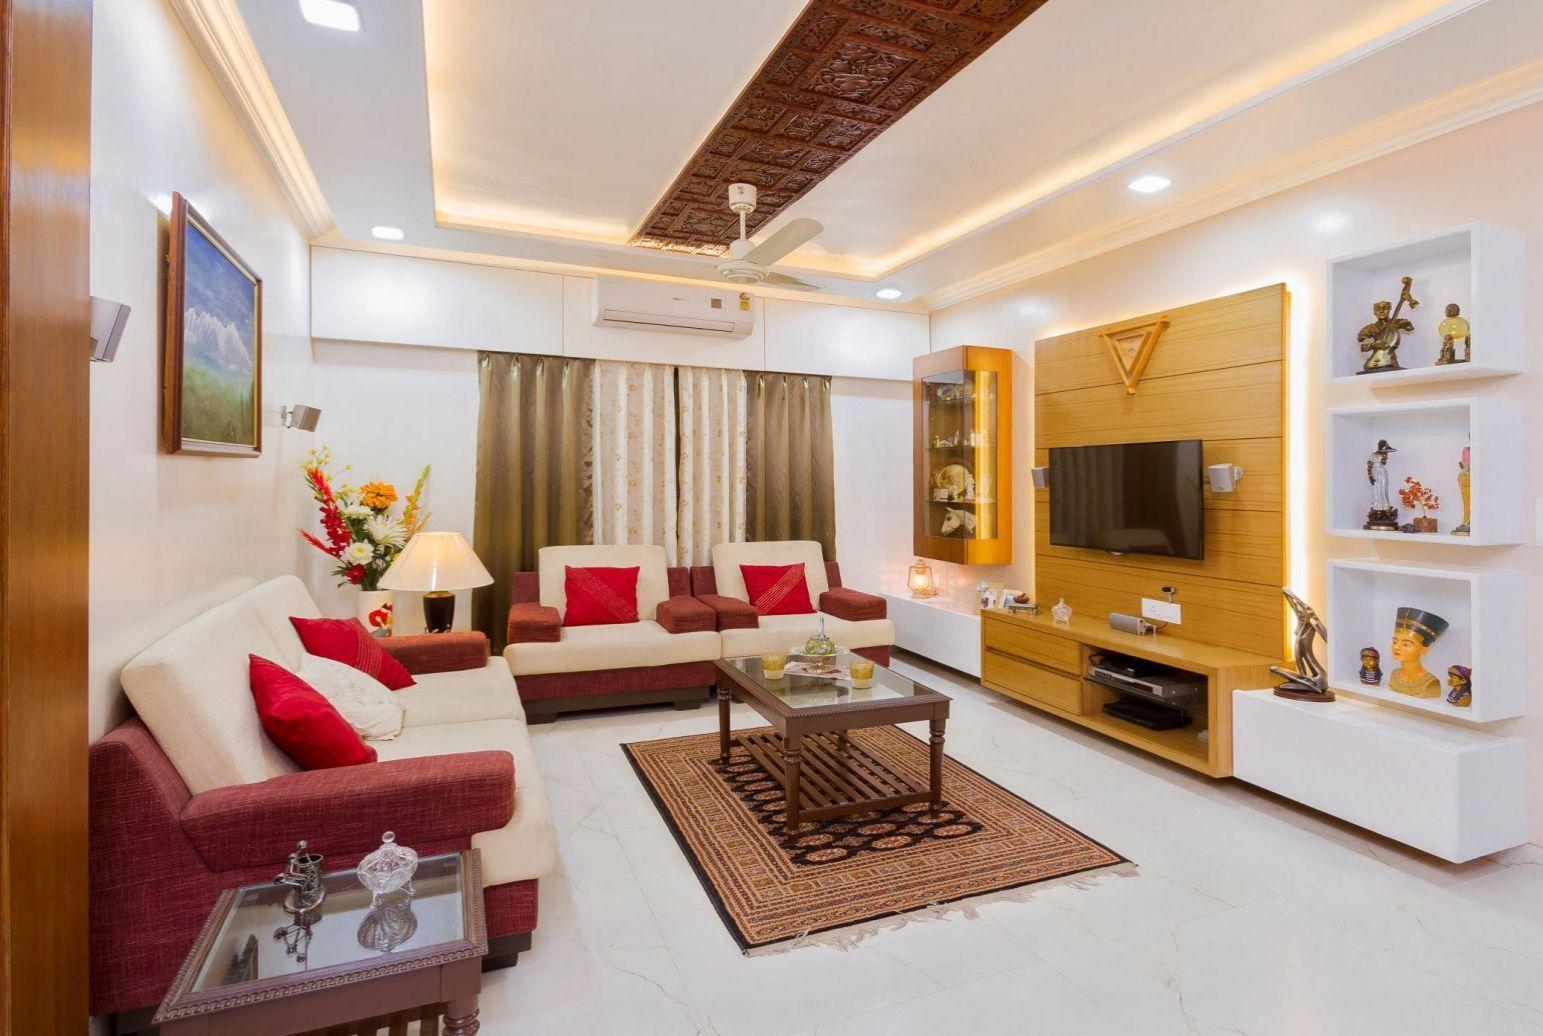 14495694252 Jpg 1543 1036 Modern Living Room Interior Bed